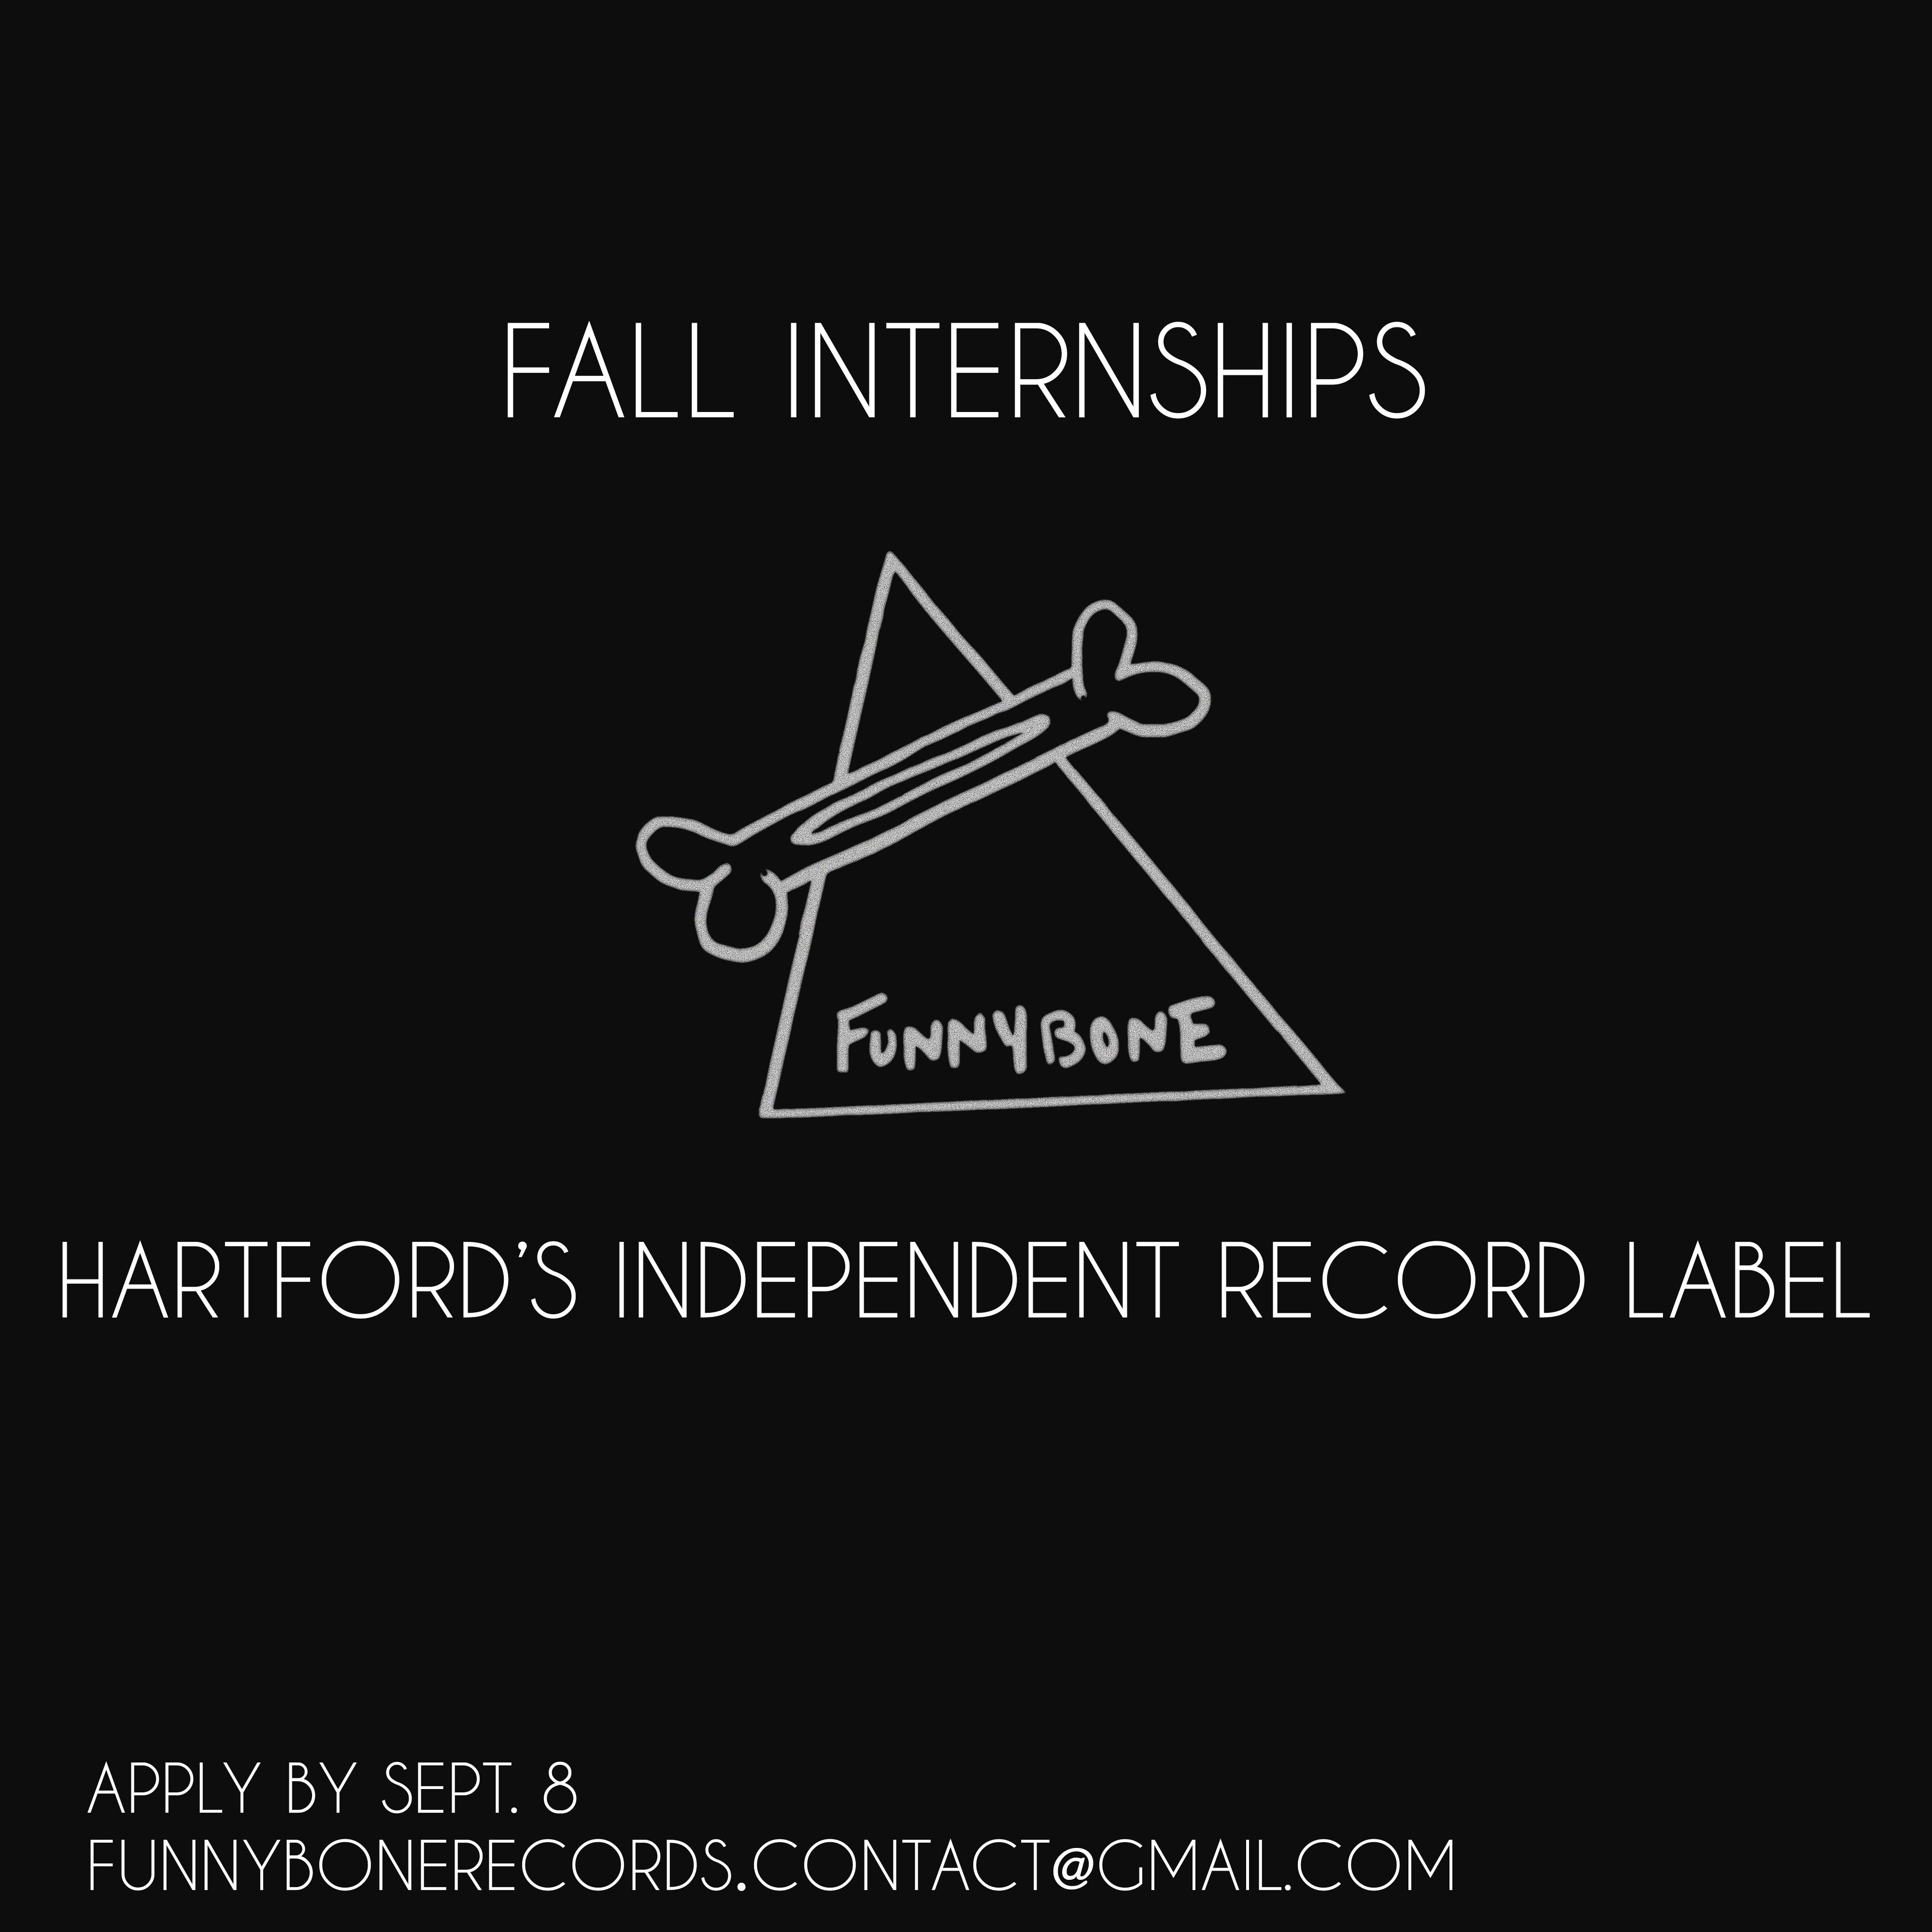 funnybone internship poster